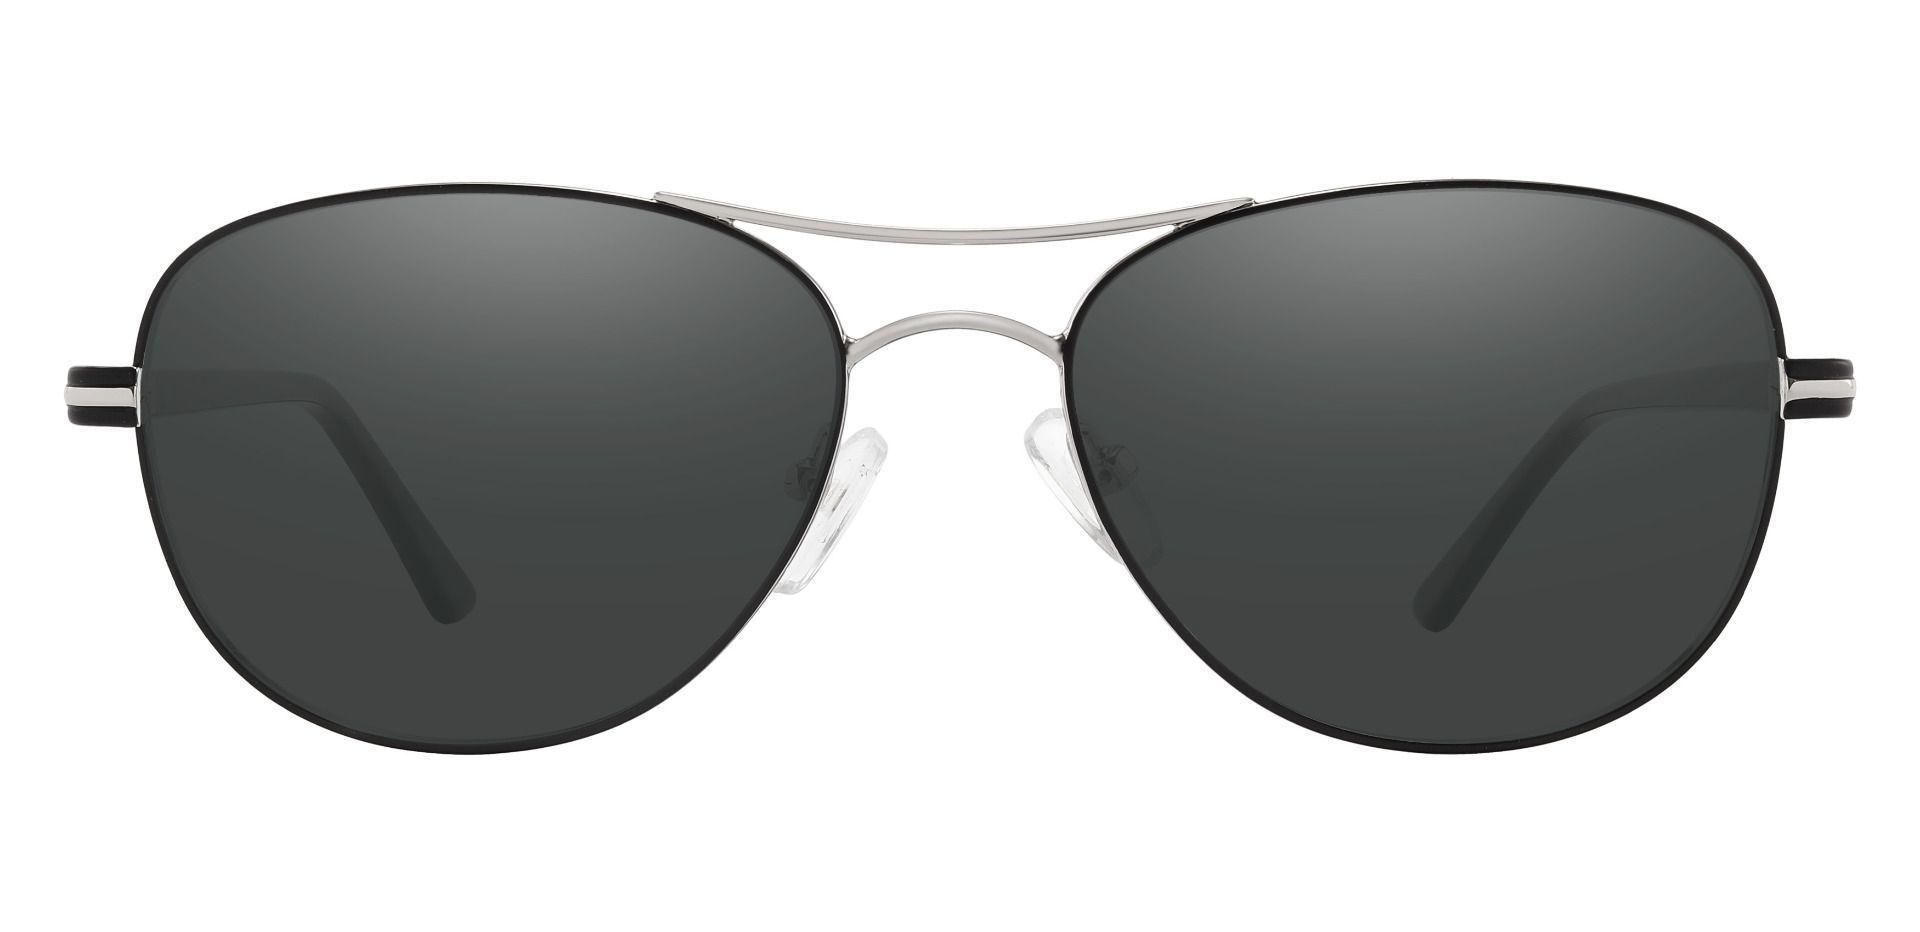 Reeves Aviator Prescription Sunglasses - Silver Frame With Gray Lenses